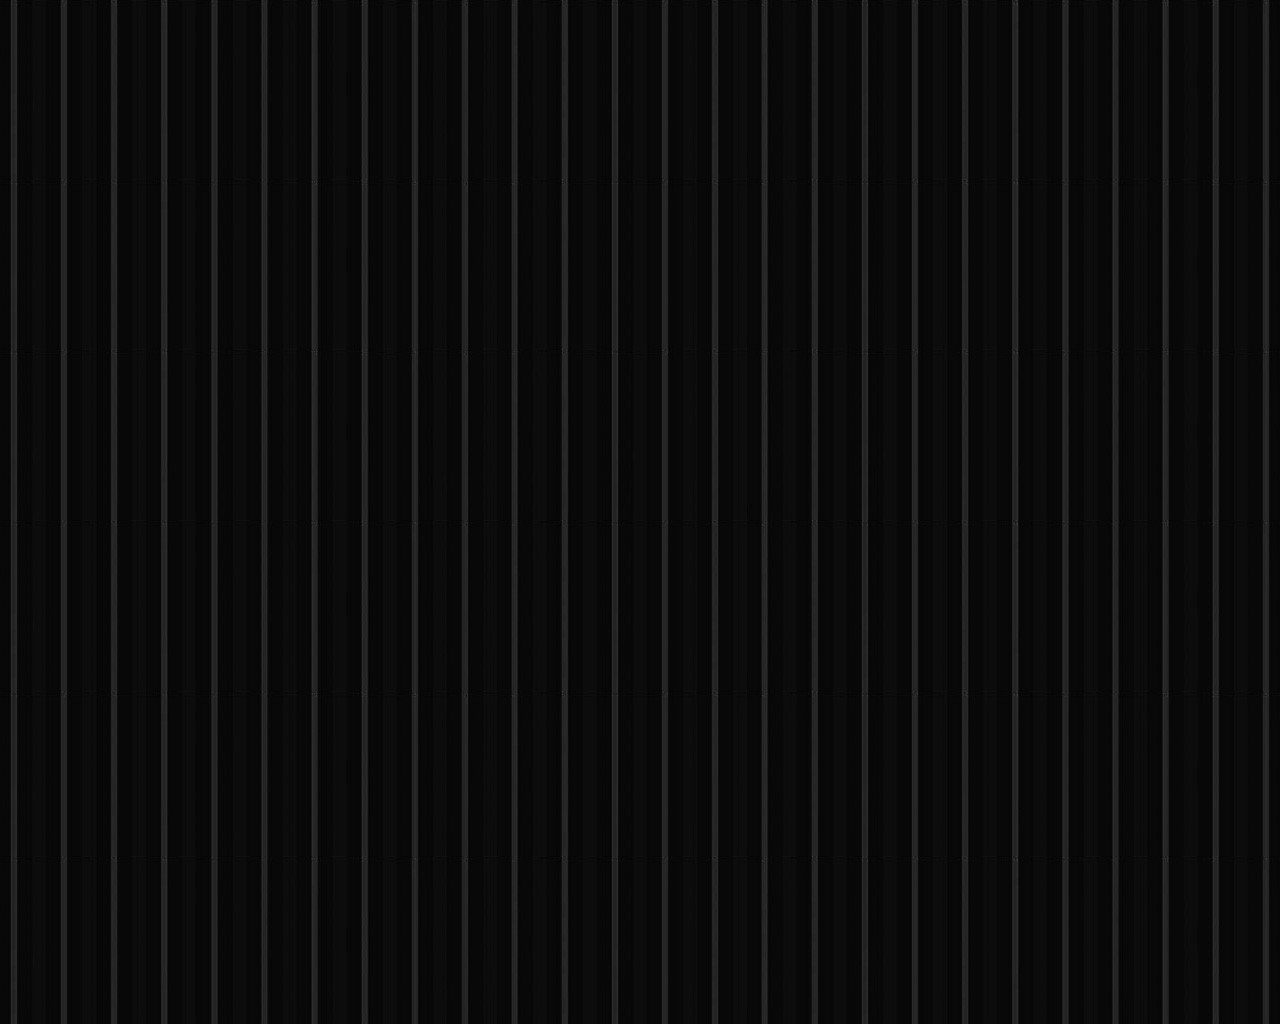 Black Wood Wallpaper Black Lines Graphic Preview Createblog